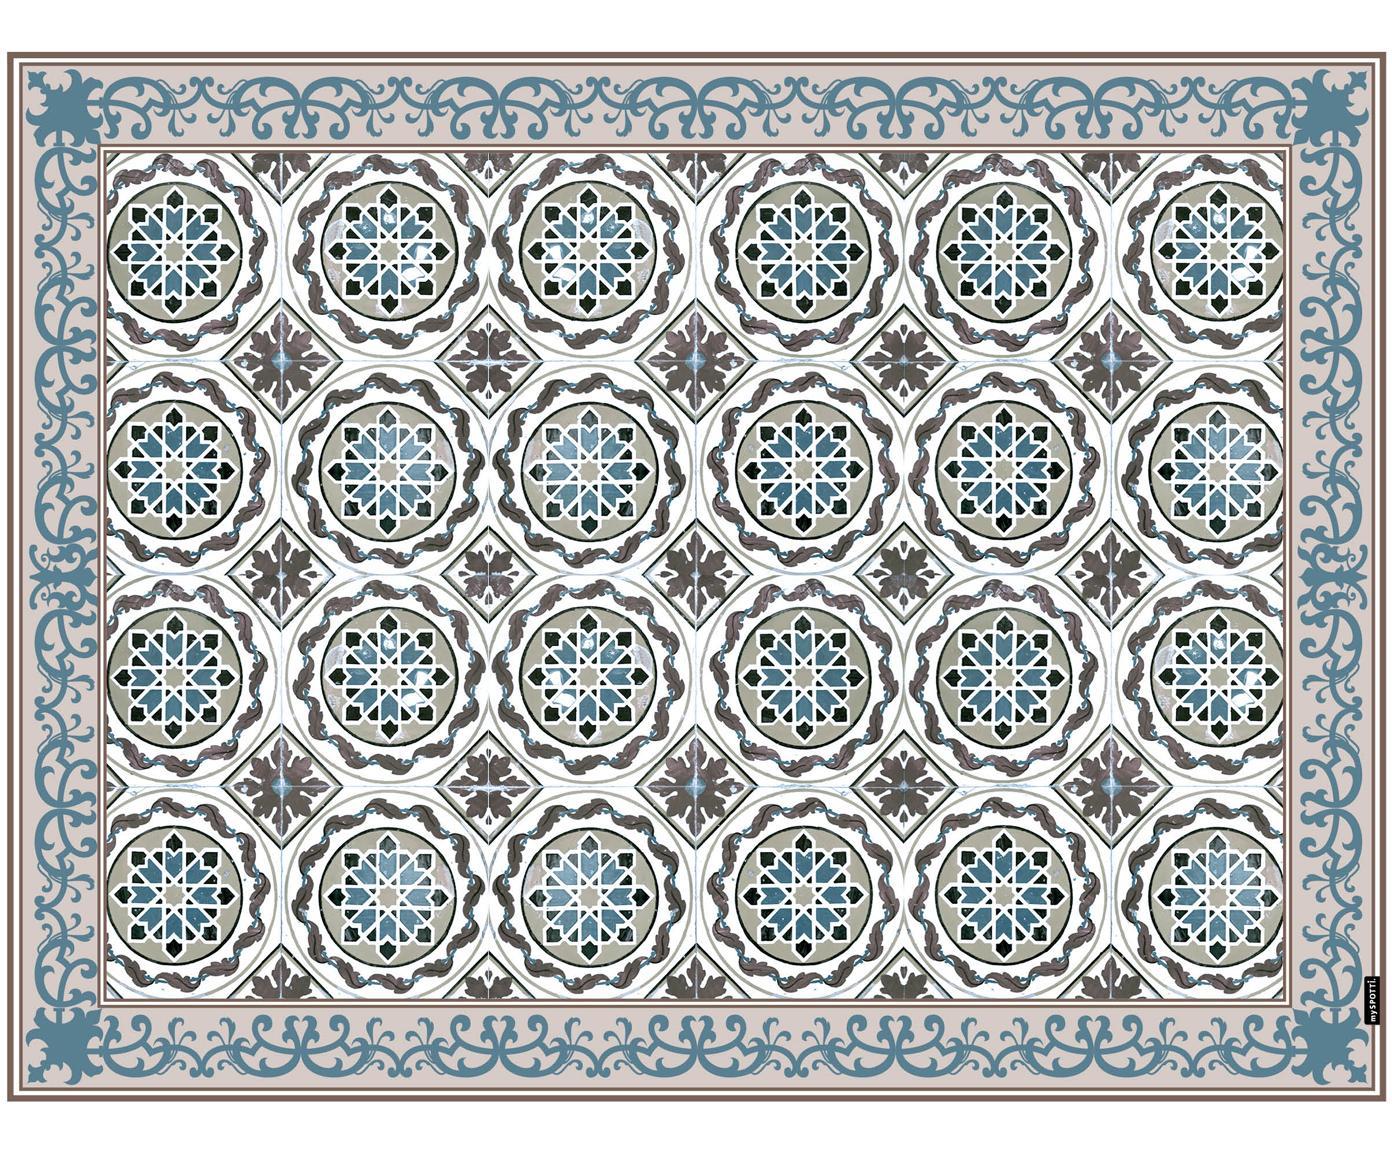 Passatoia in vinile riciclabile Selina, Vinile riciclabile, Beige, marrone, blu, Larg. 65 x Lung. 85 cm